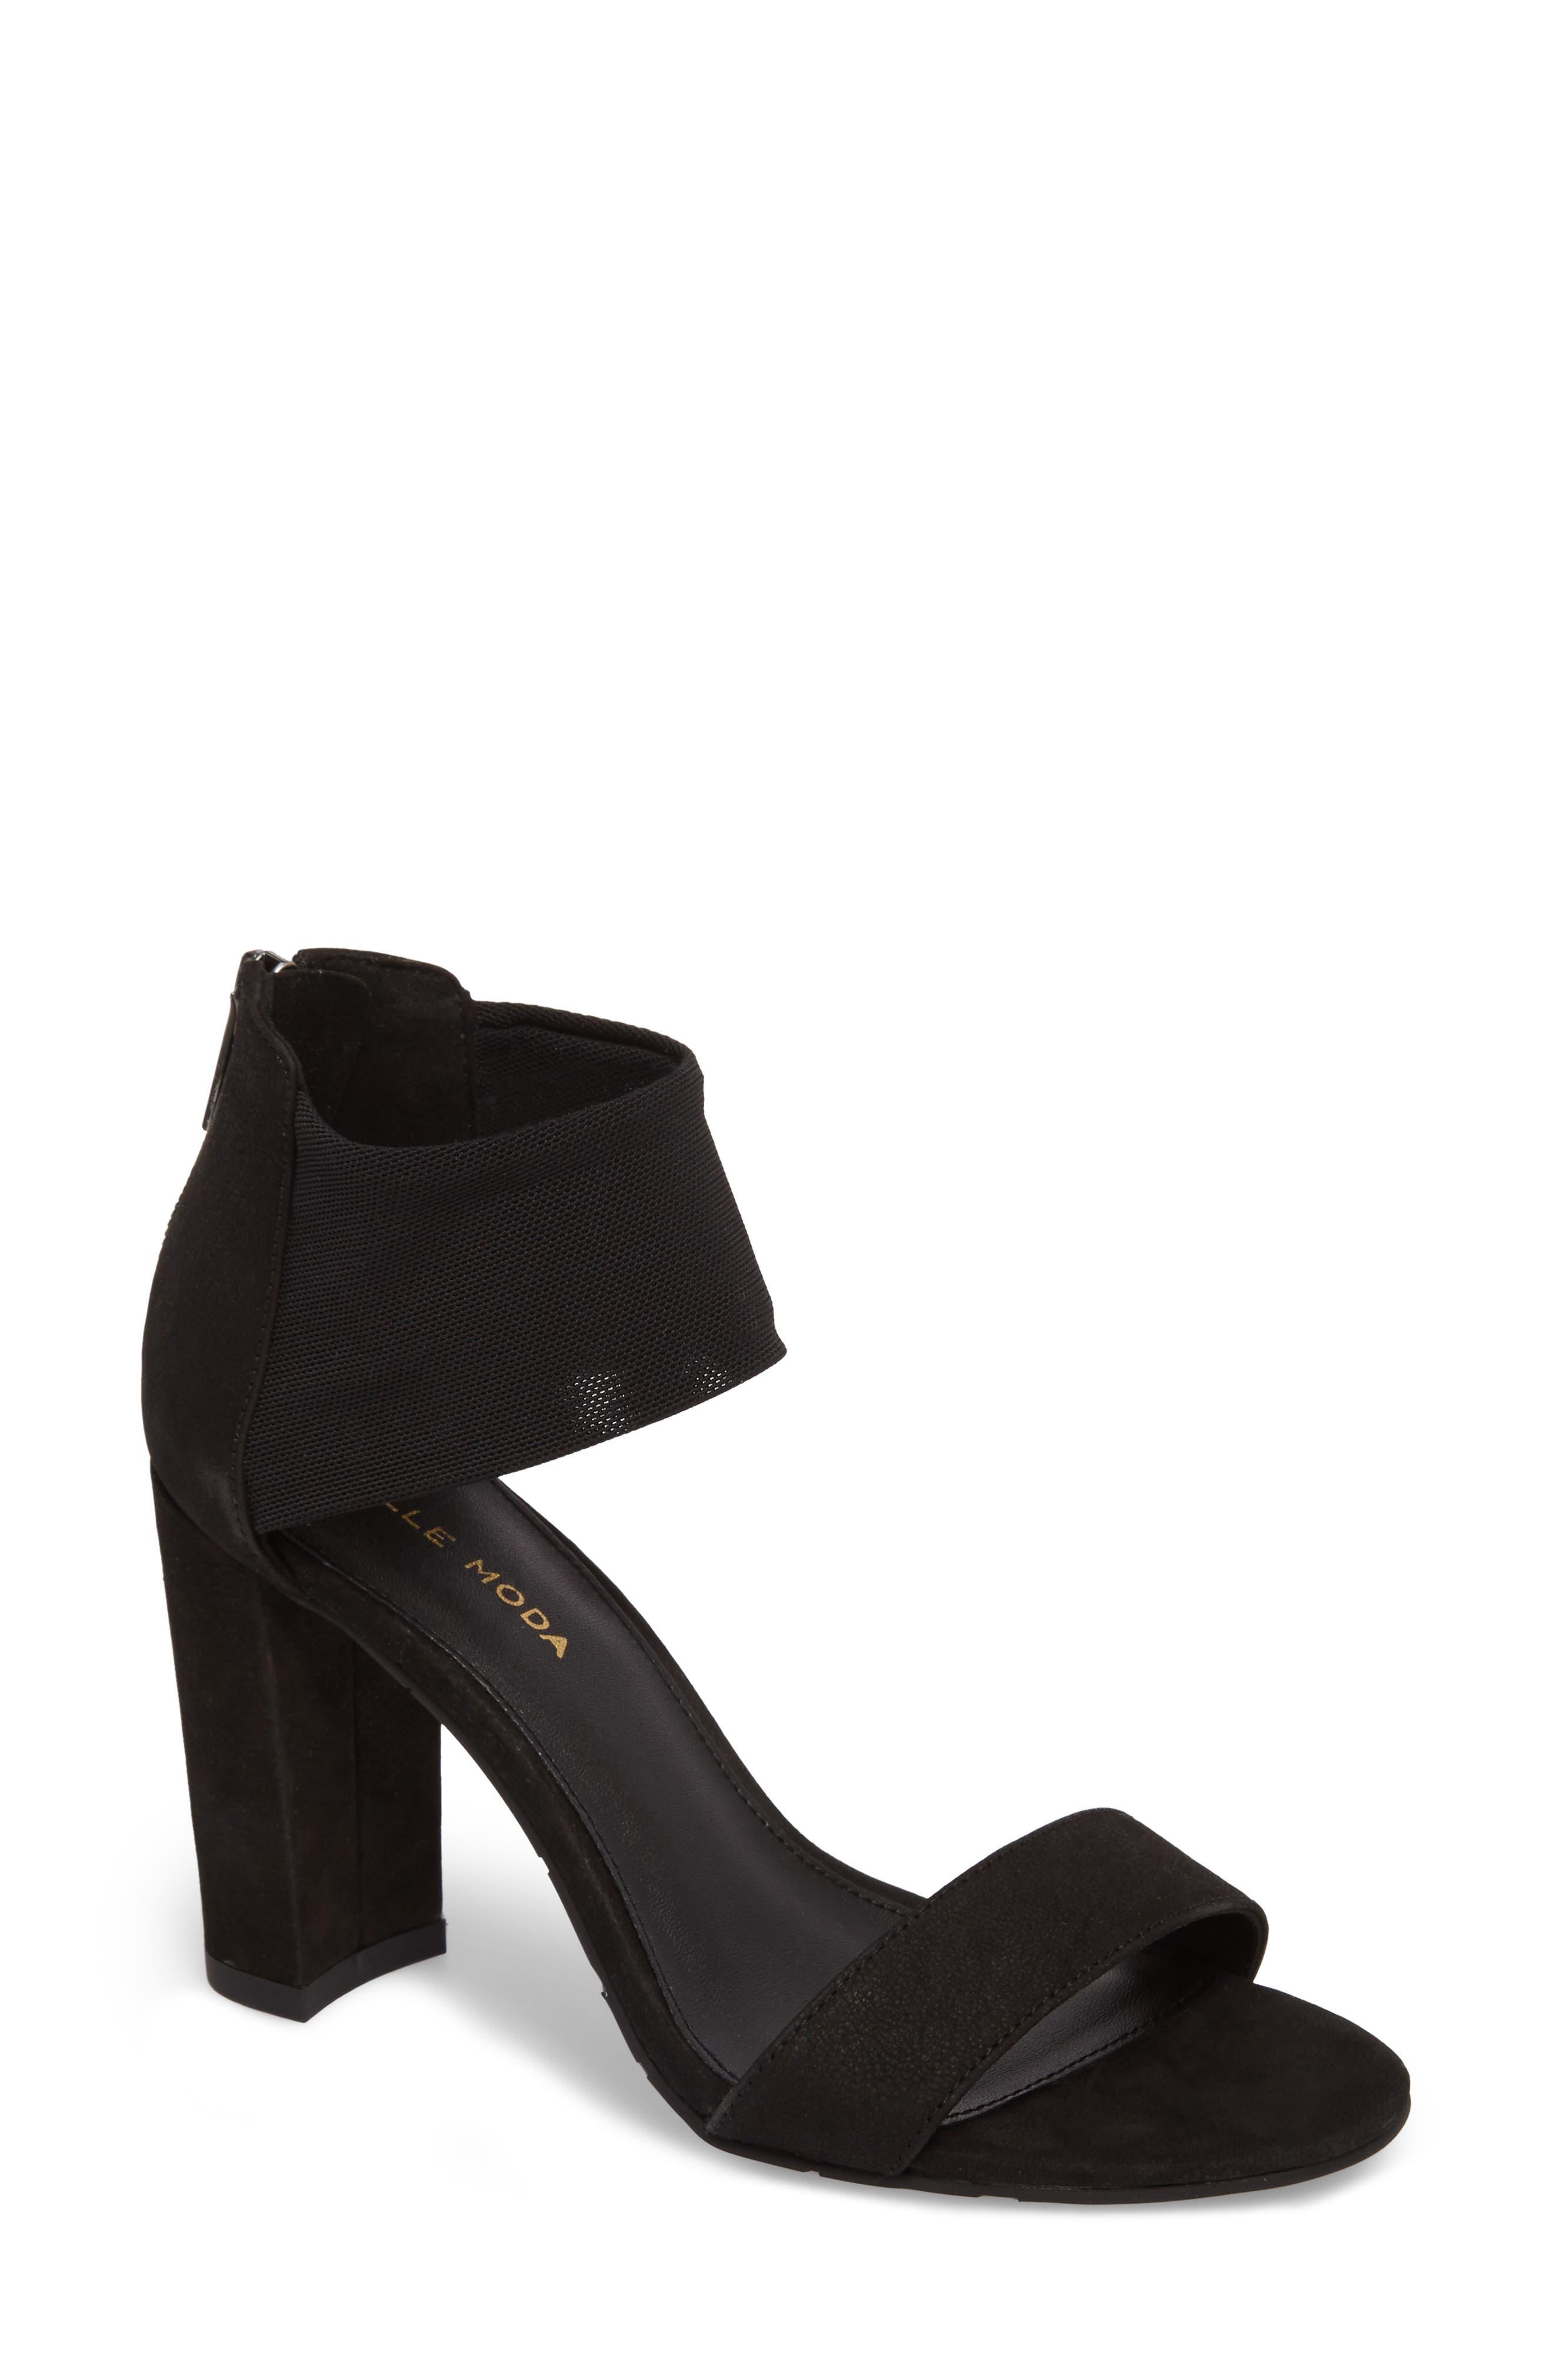 Fawn Sandal,                         Main,                         color, BLACK NUBUCK LEATHER